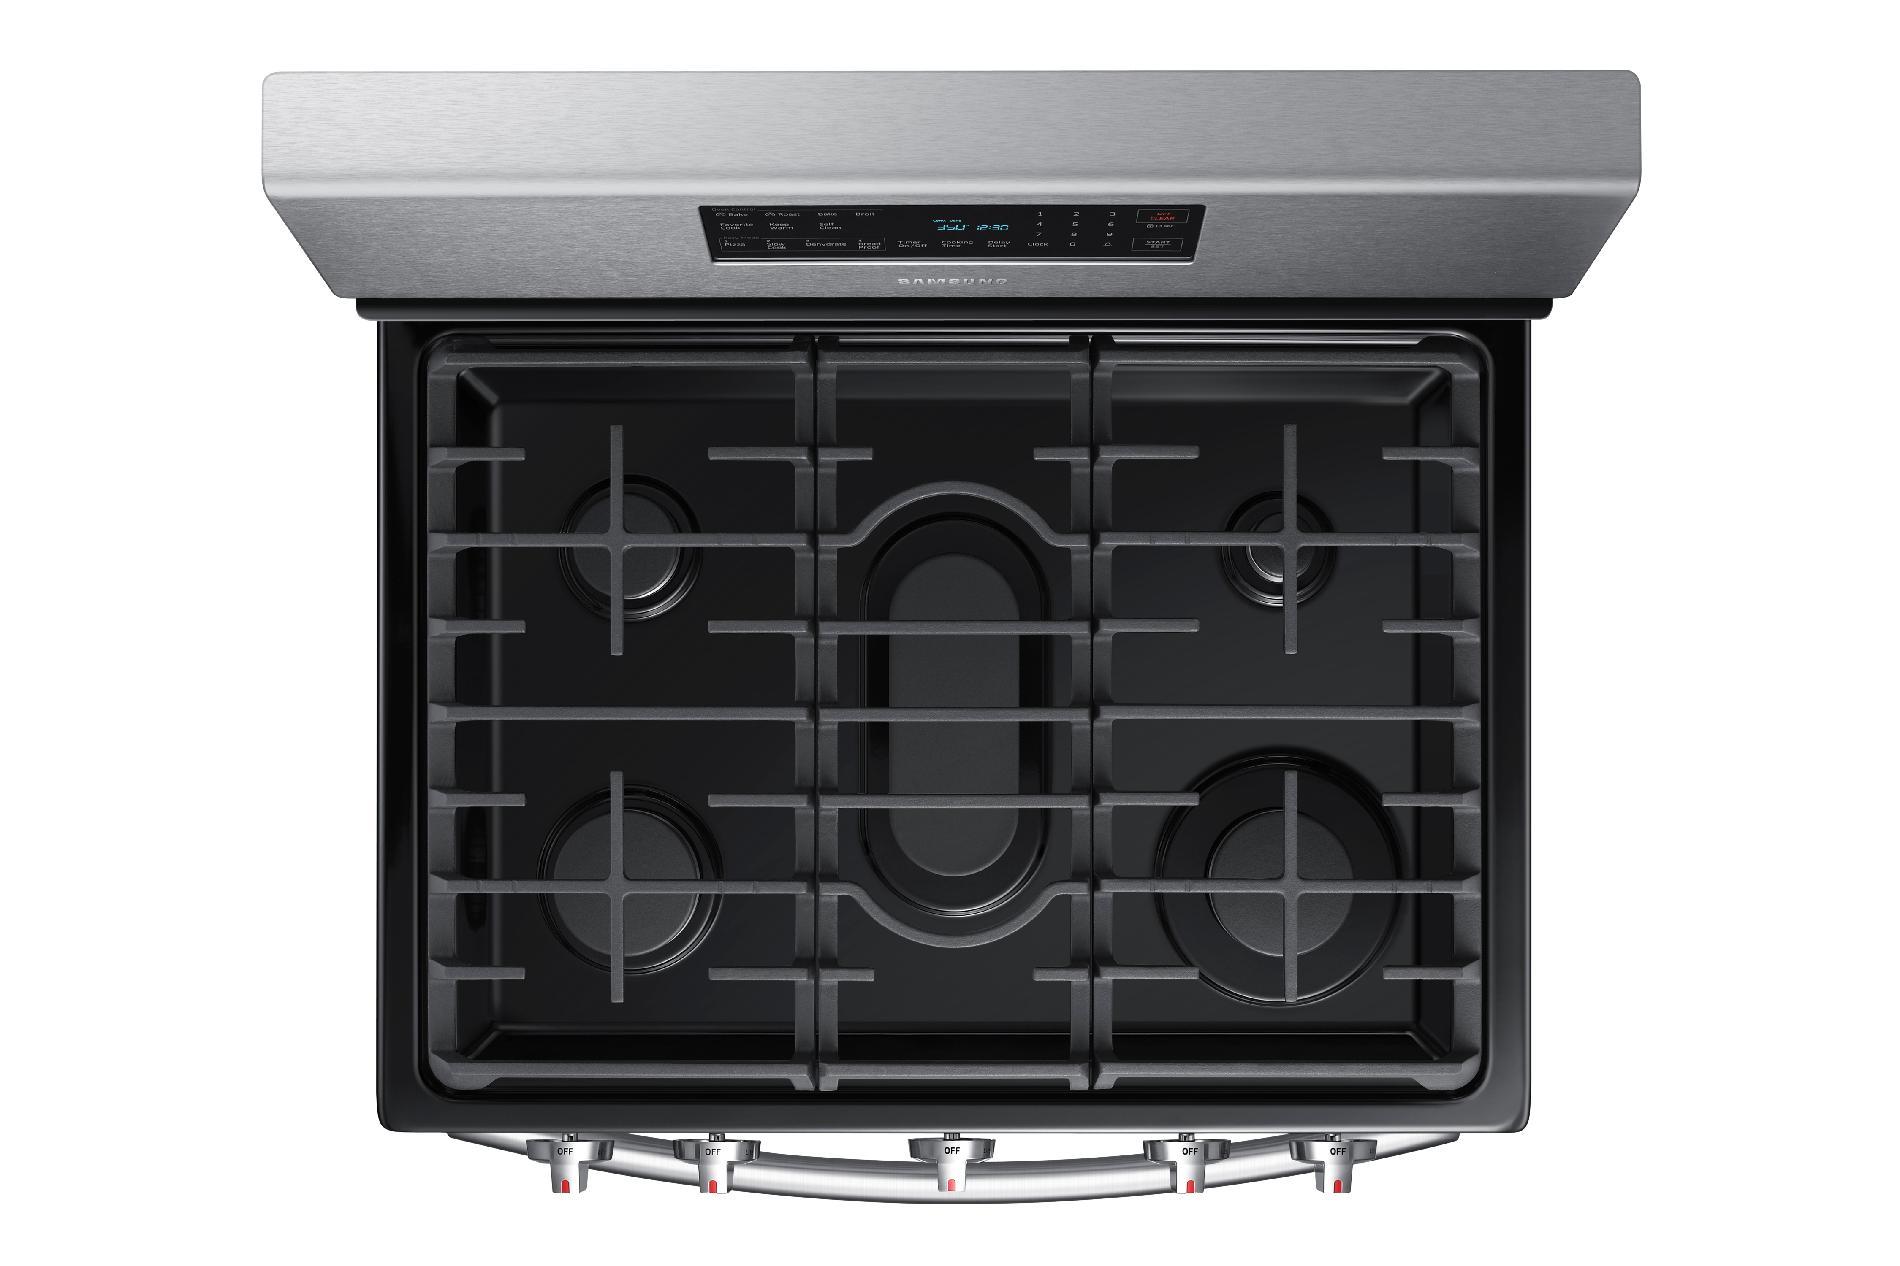 Samsung NX58H5600SS 5.8 cu. ft. Gas Range w/ 5-Burner Cooktop - Stainless Steel